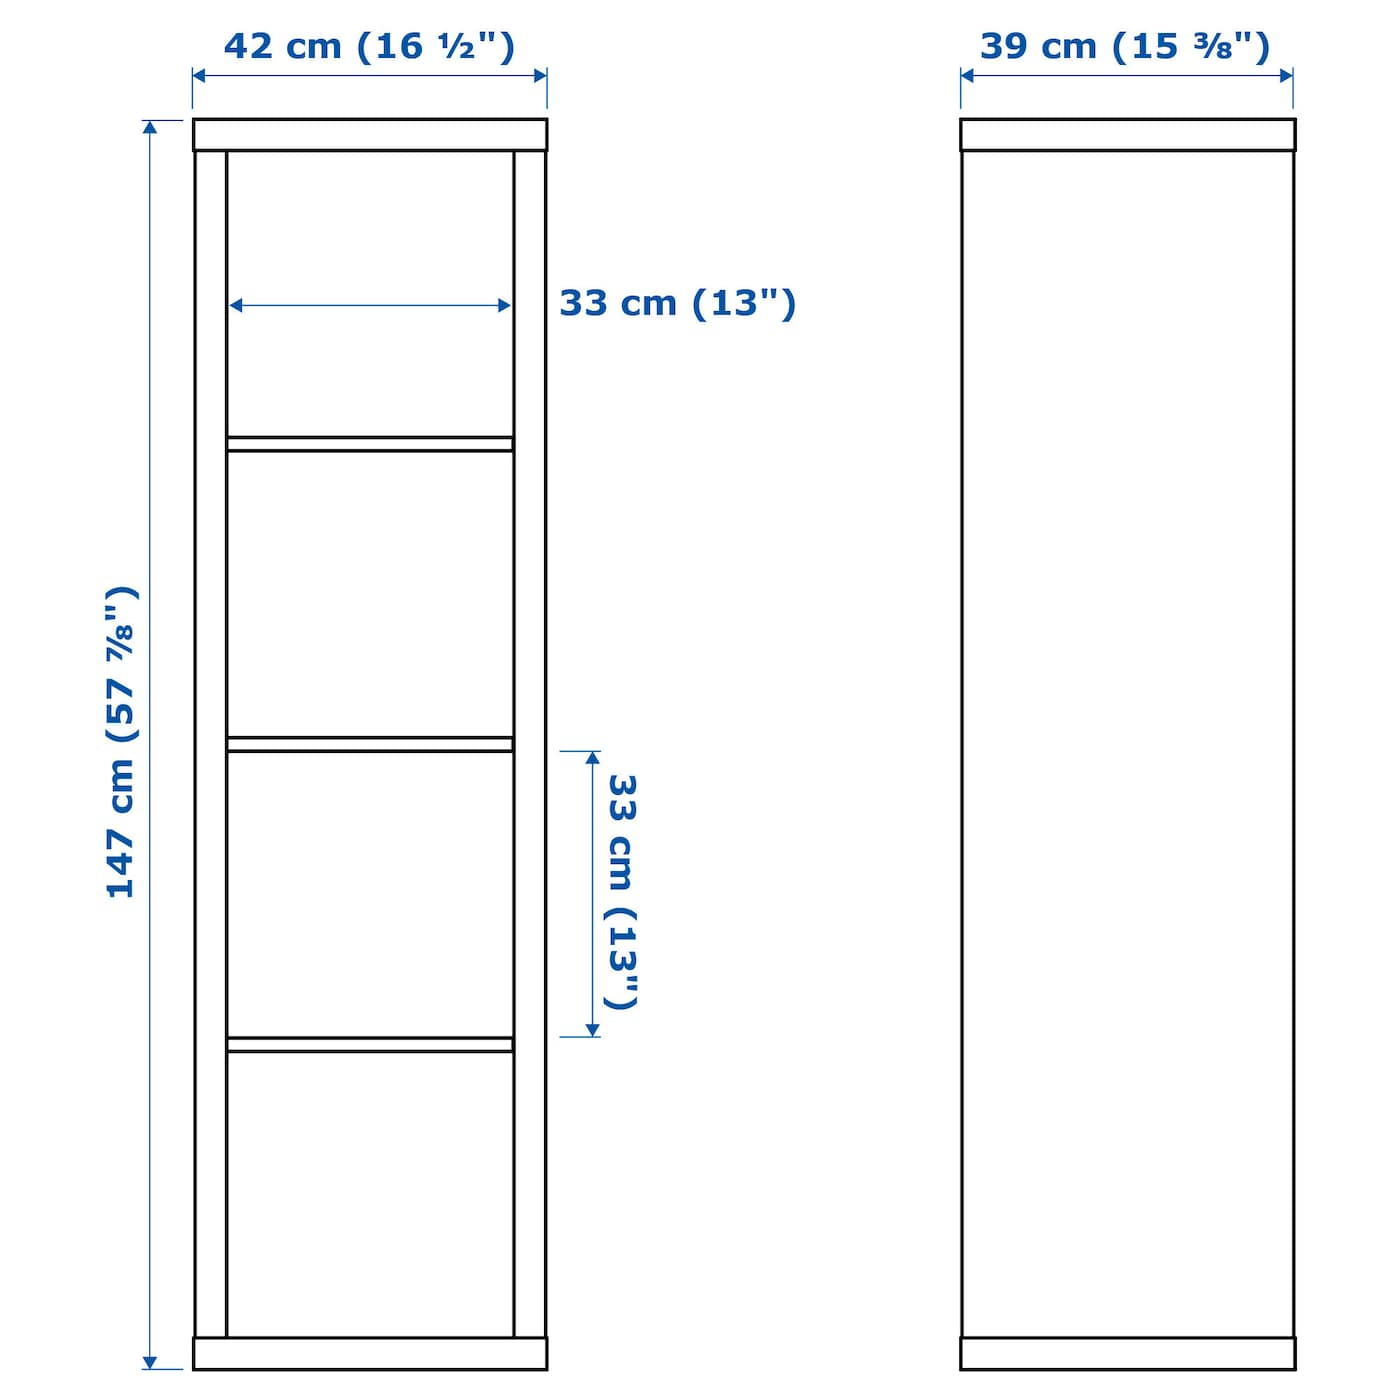 https://www.ikea.com/be/nl/images/products/kallax-shelving-unit-white__0545863_PE655748_S5.JPG